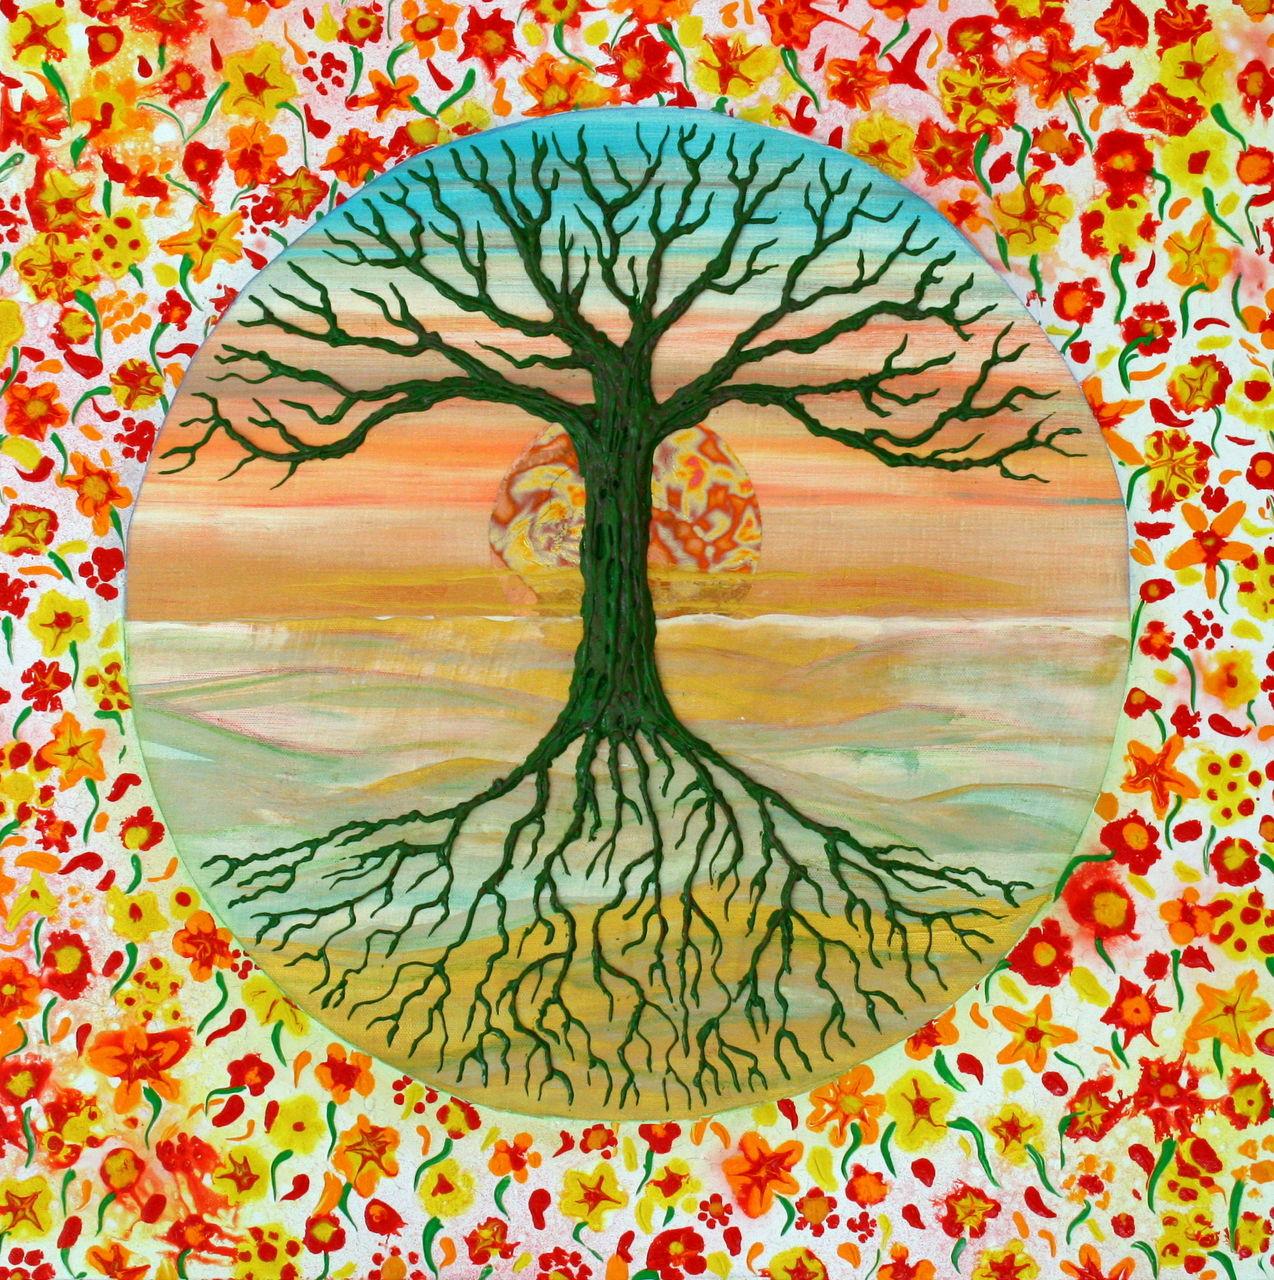 bild blumen lebensbaum baum des lebens tree of life. Black Bedroom Furniture Sets. Home Design Ideas